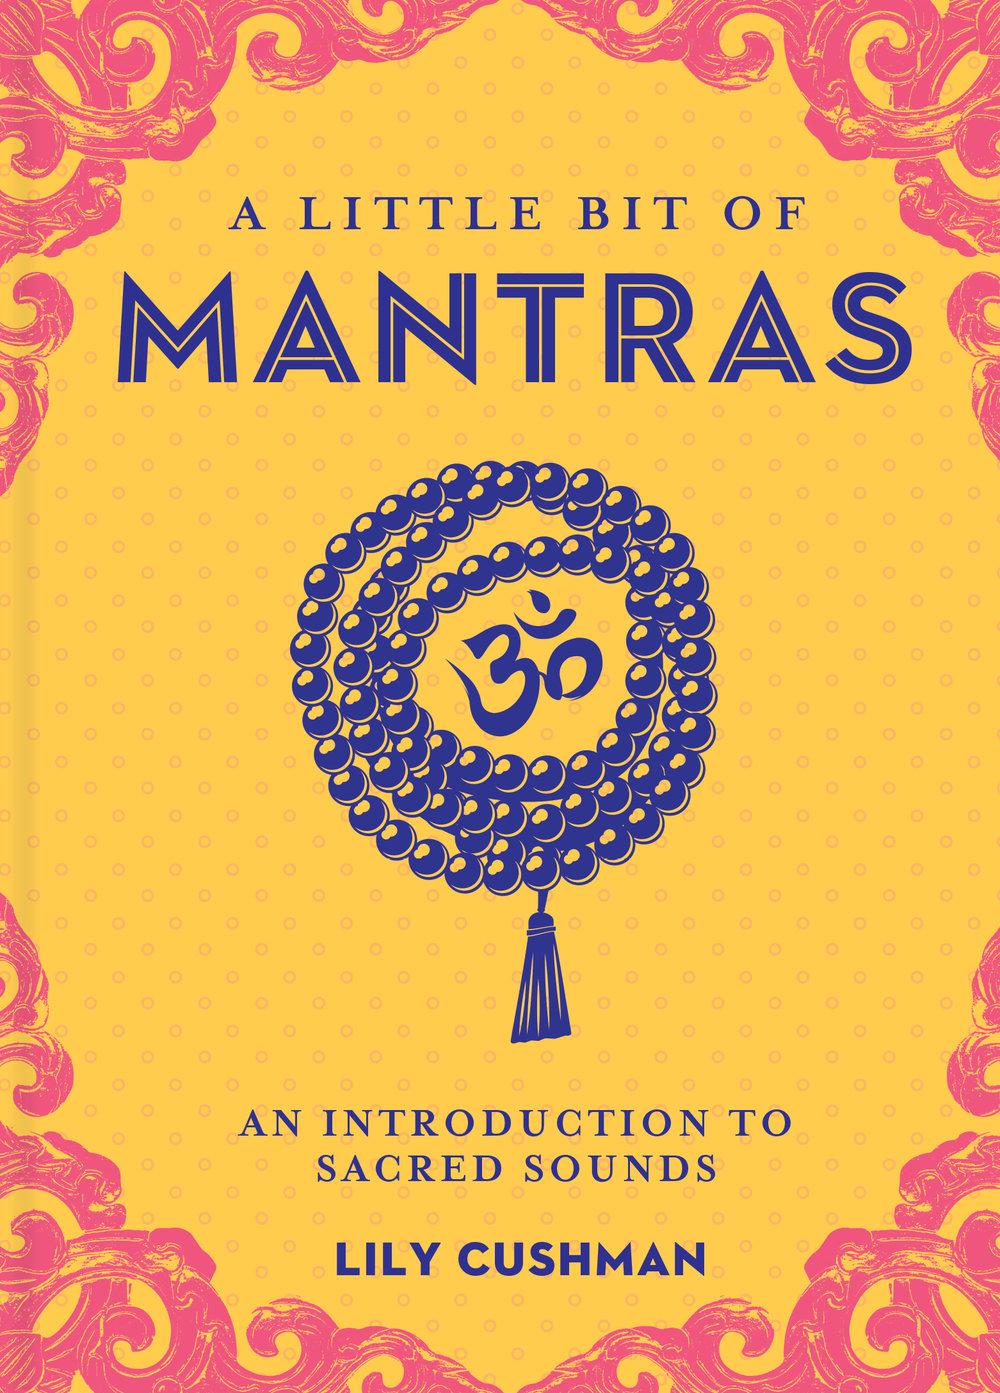 A-Little-Bit-Of-Mantras-Lily-Cushman.jpg